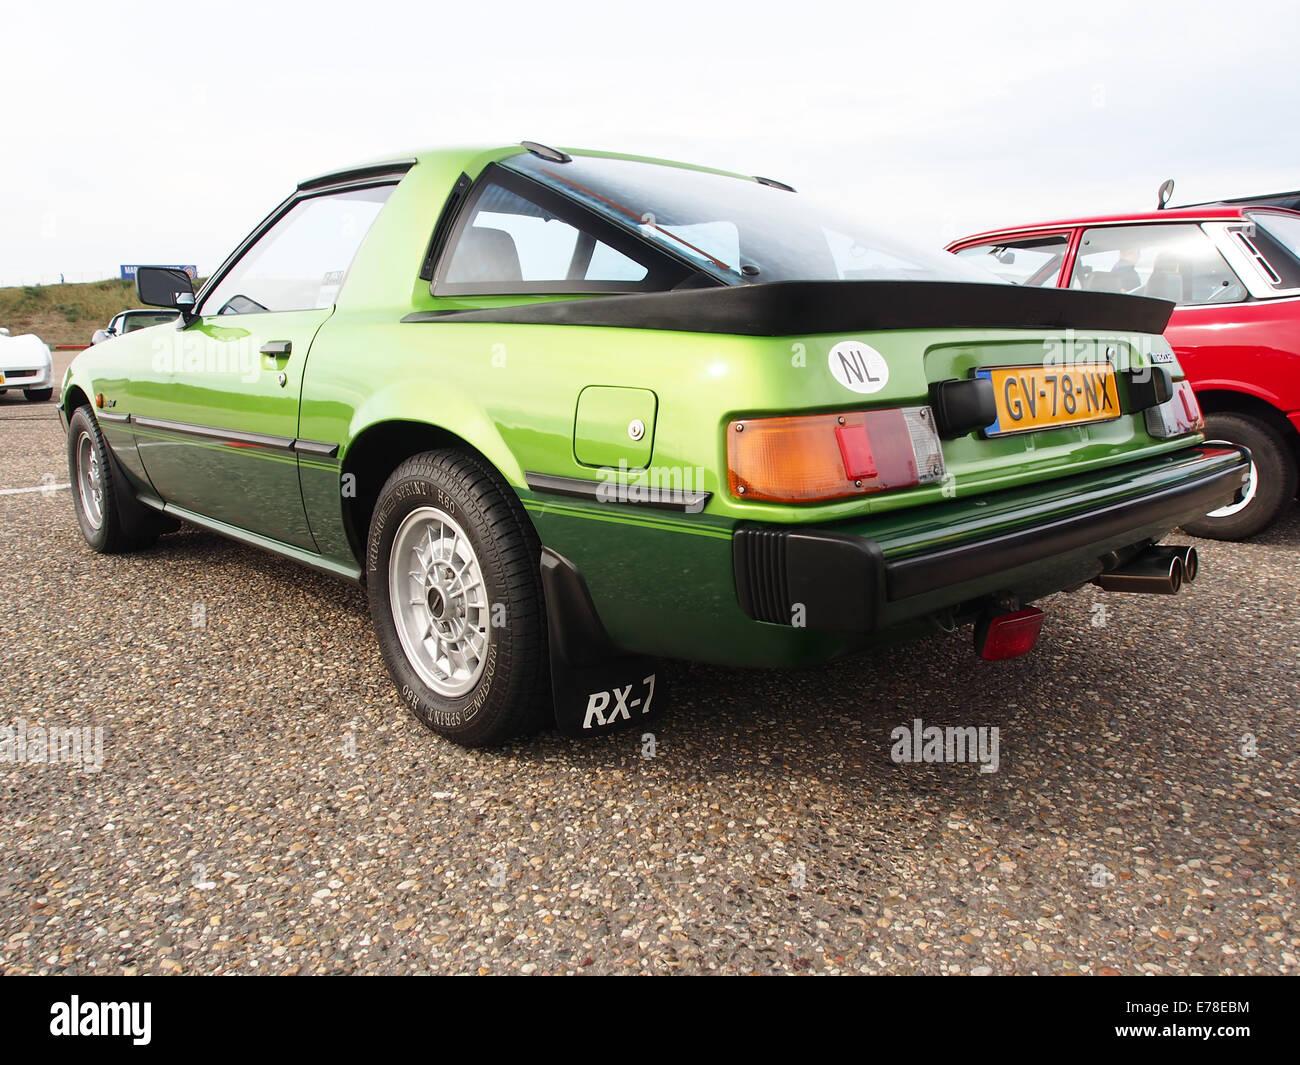 1981 MAZDA RX-7, GV-78-NX, pic2 Lizenz Stockbild